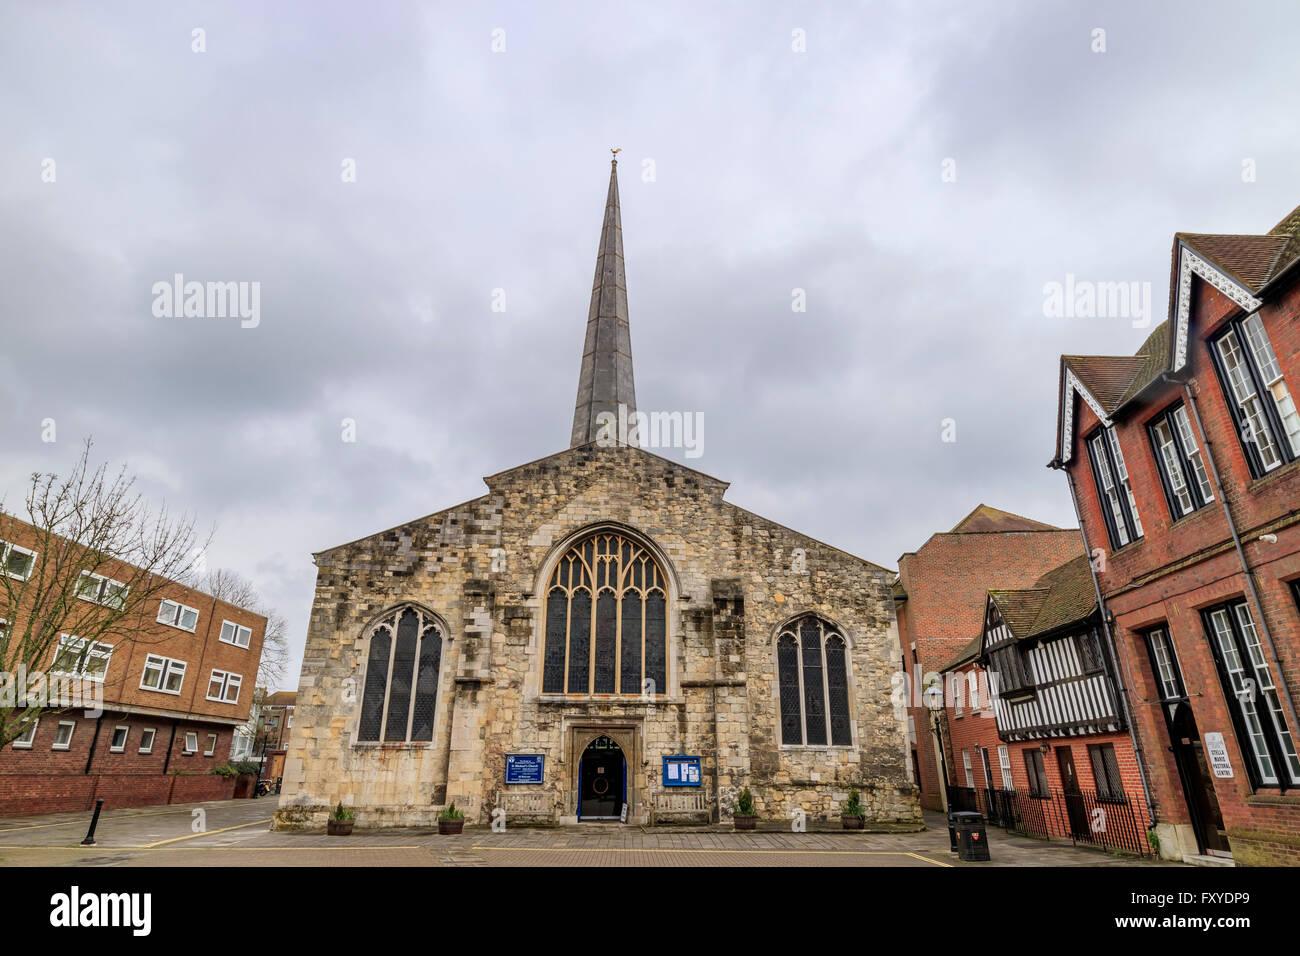 The historical Saint Michael's Church at Southampton, UK - Stock Image